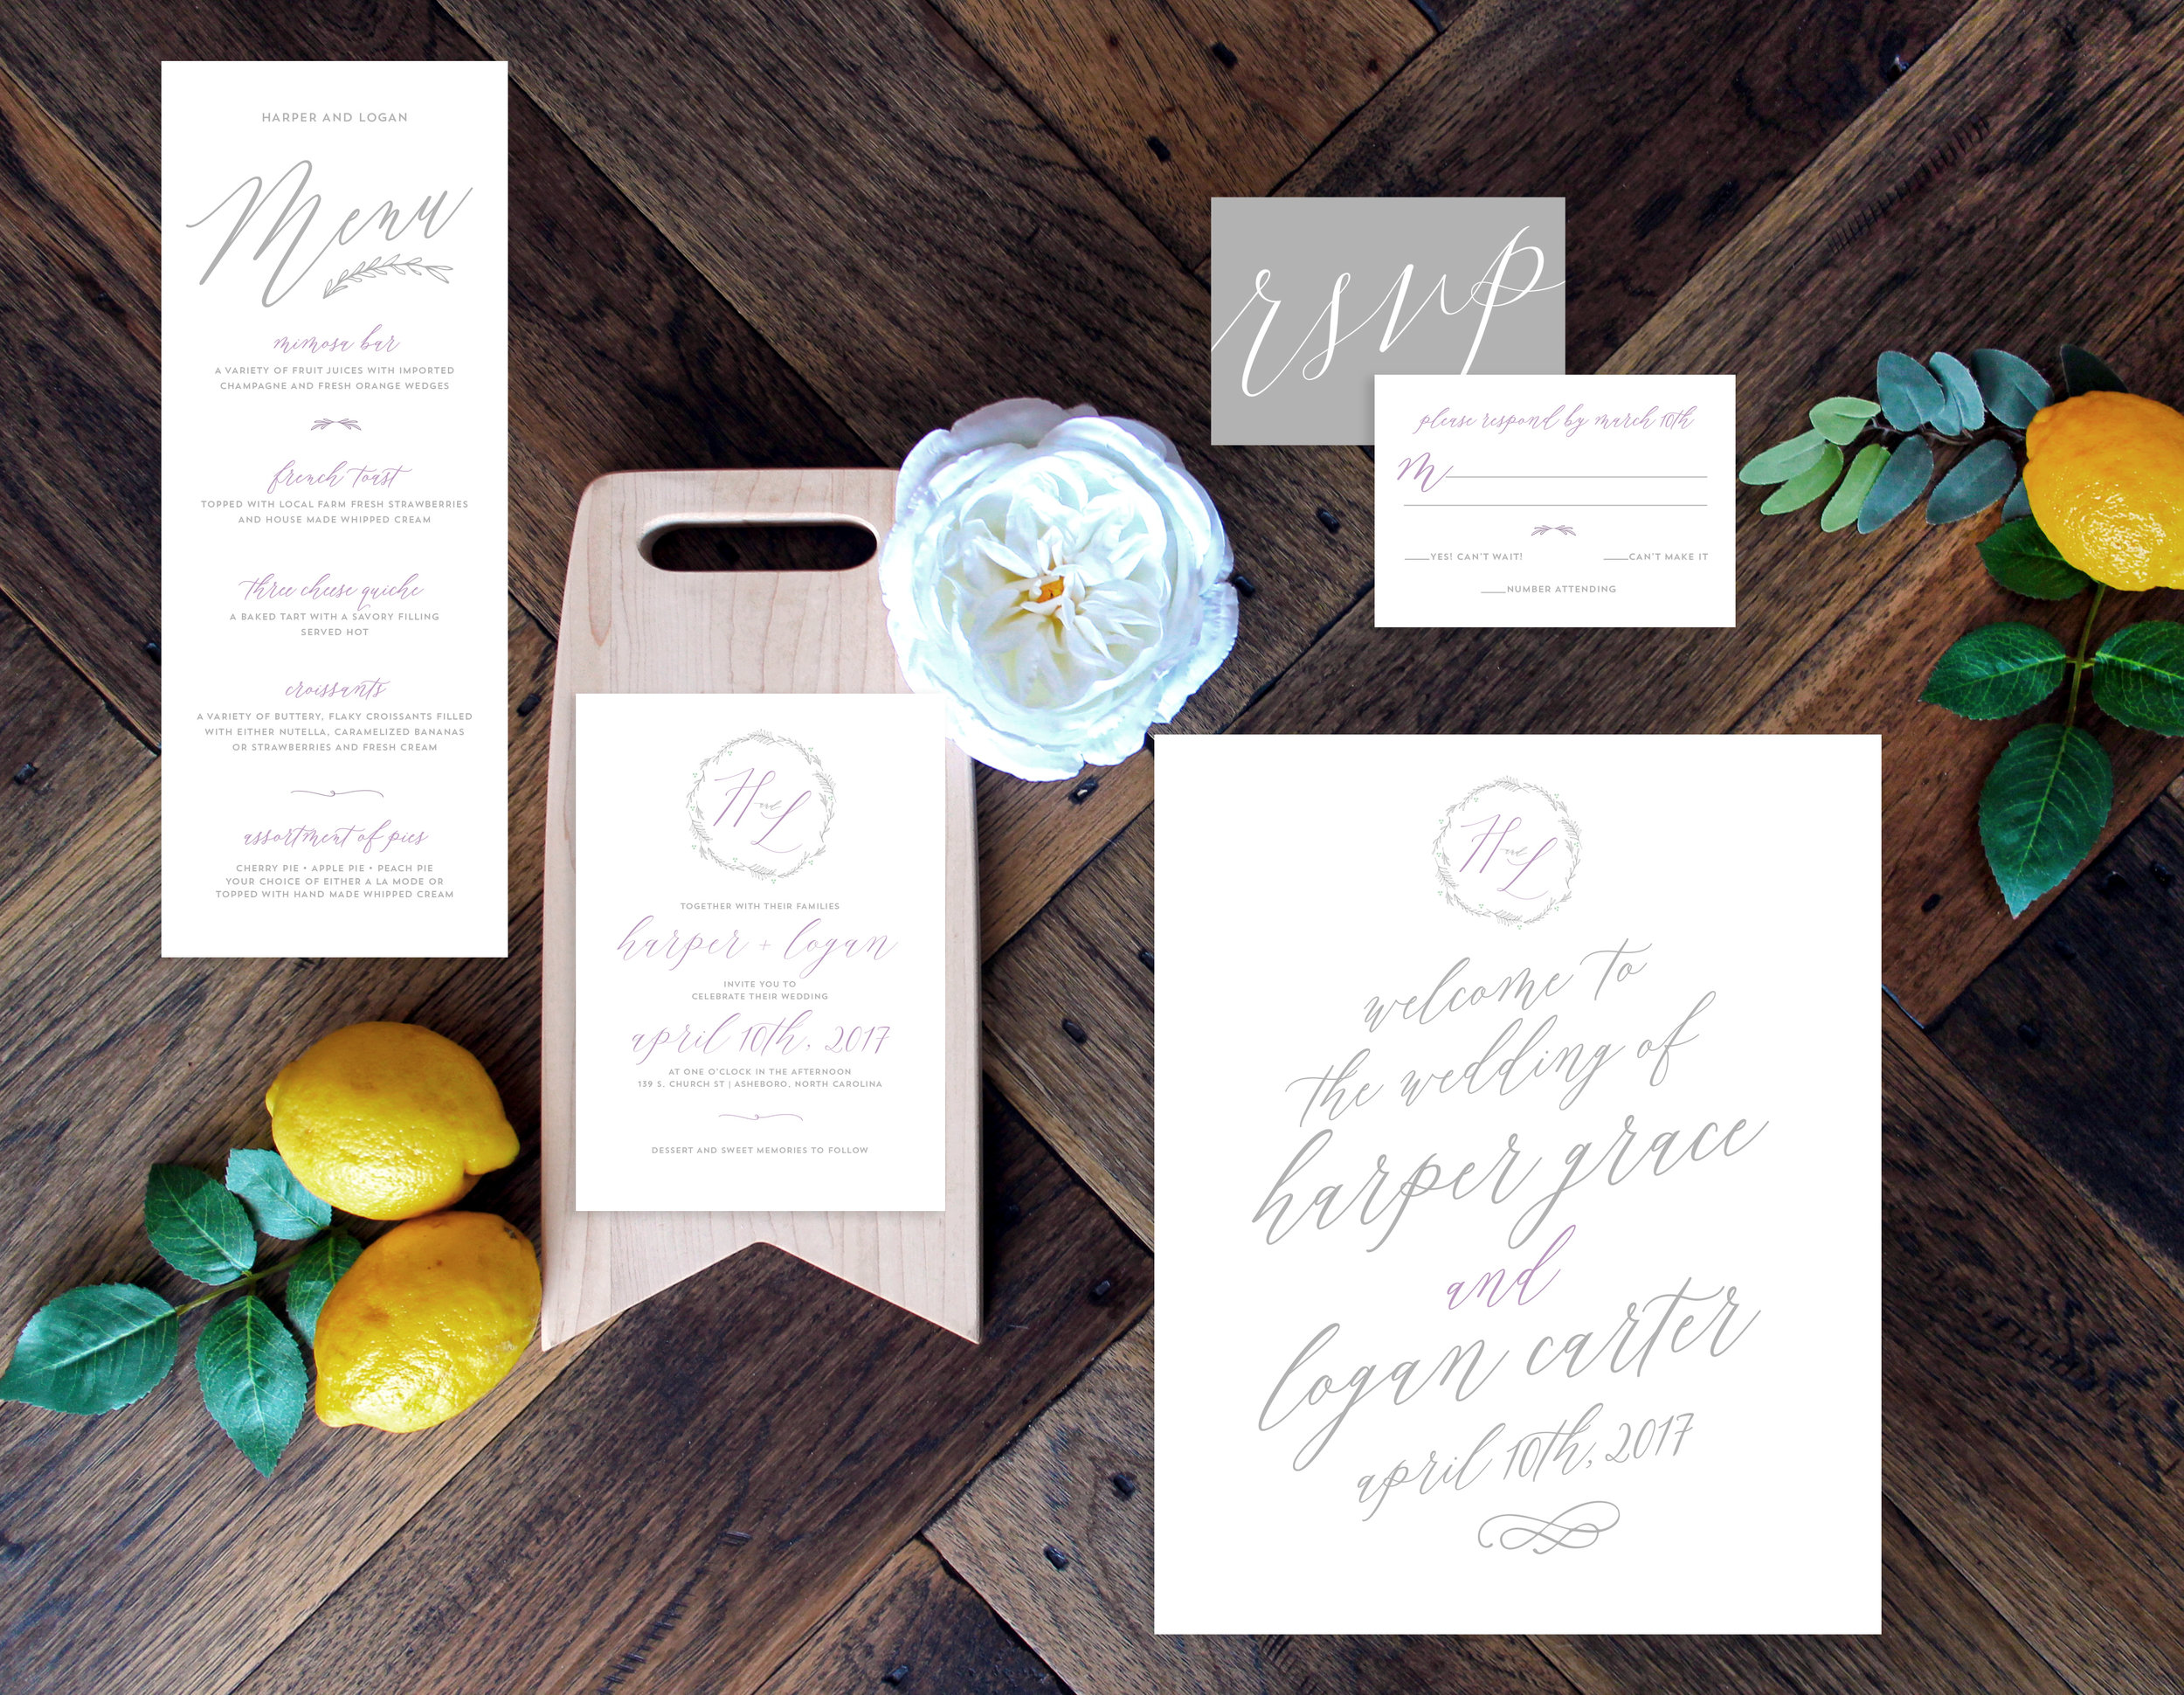 Gray & Lilac Calligraphic Suite for Your Wedding, YellowHeartArt.com @YellowHeartArt